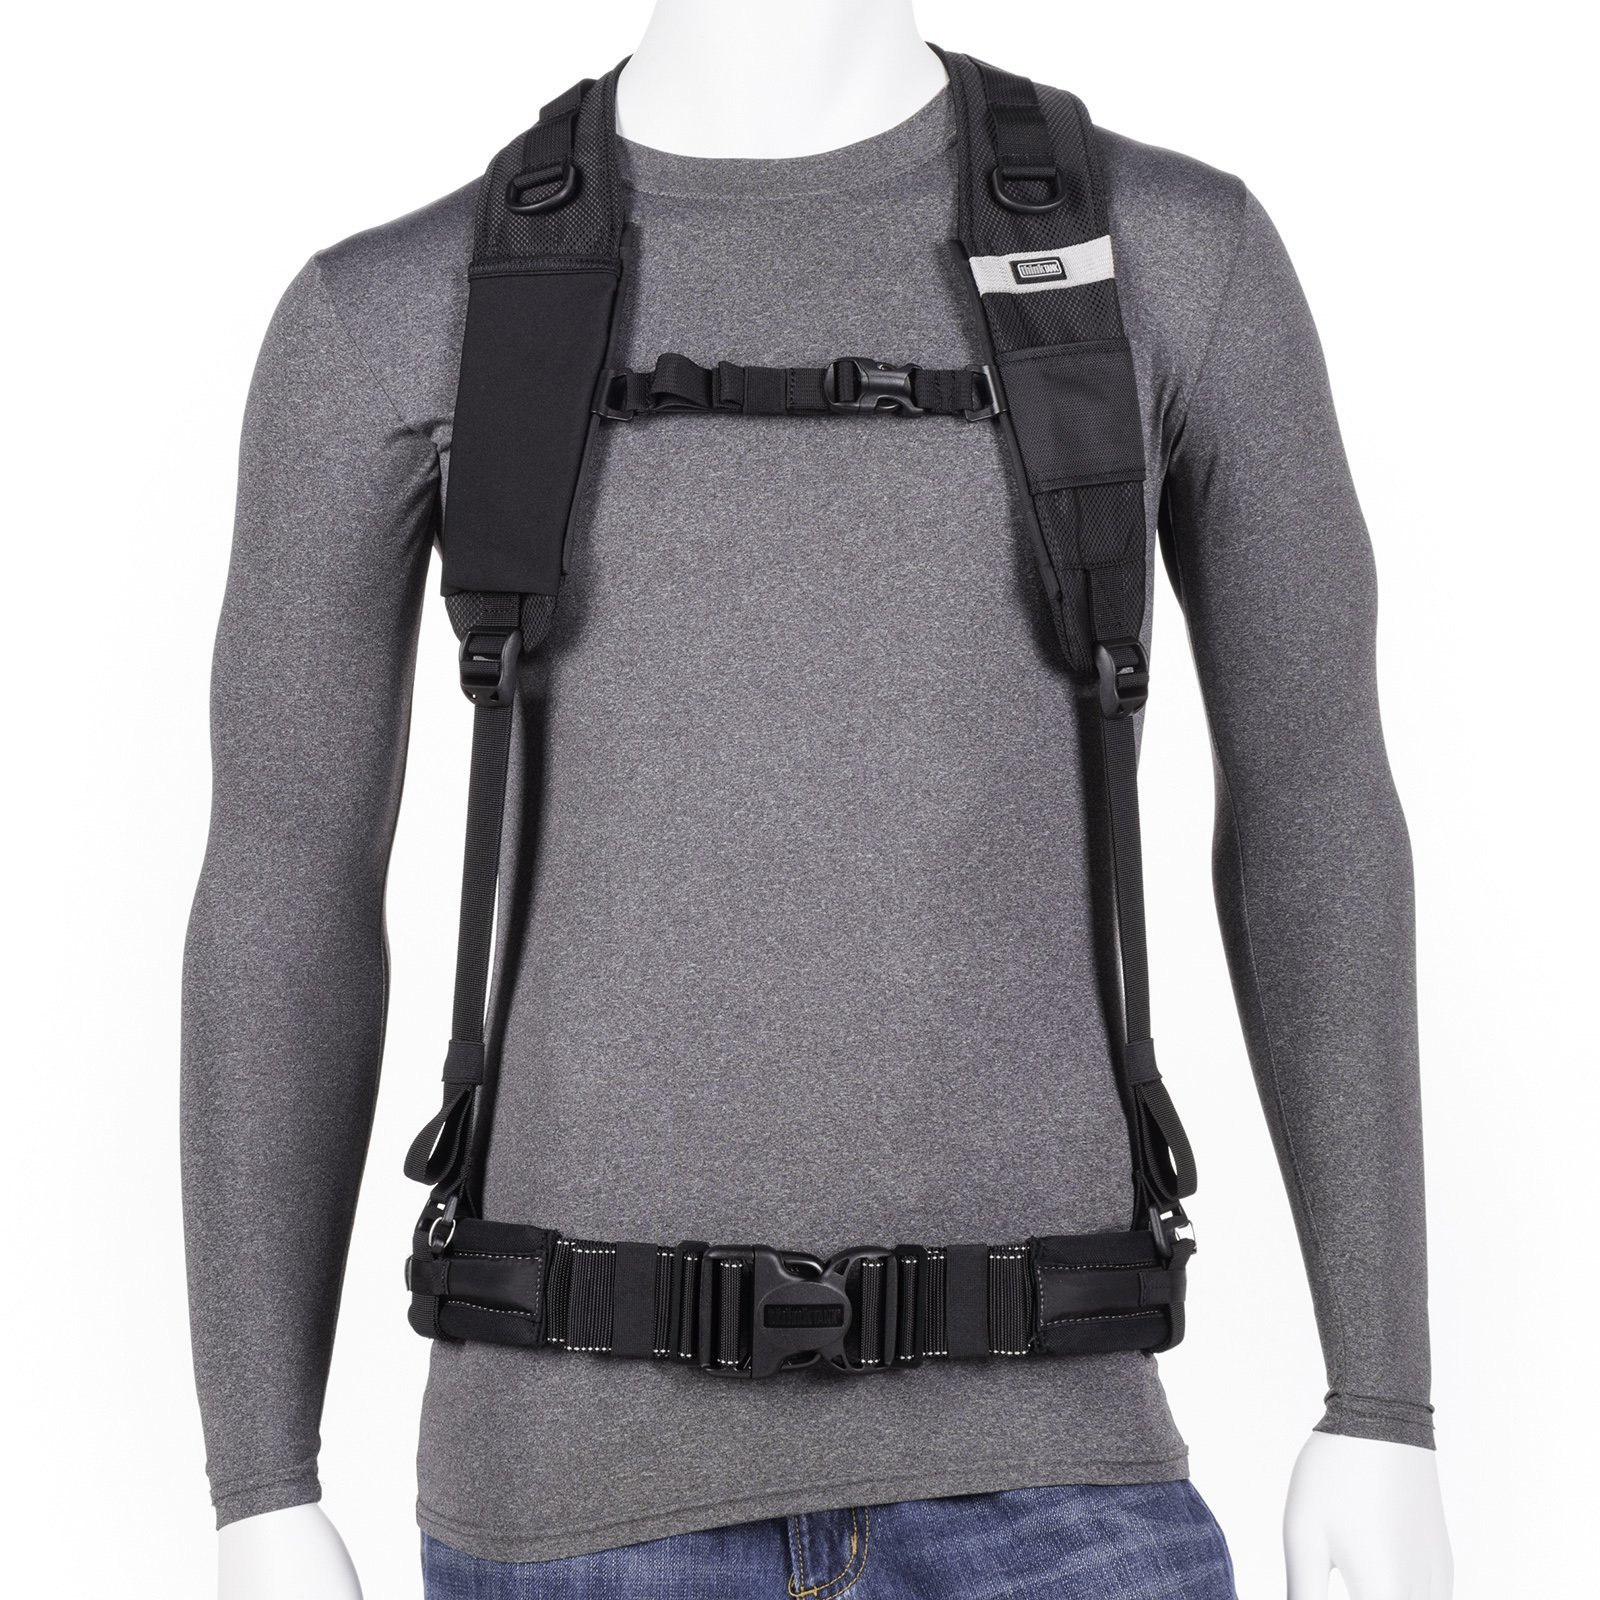 Think Tank Photo Pixel Racing Harness V3.0 Camera Strap & Harness (Black)